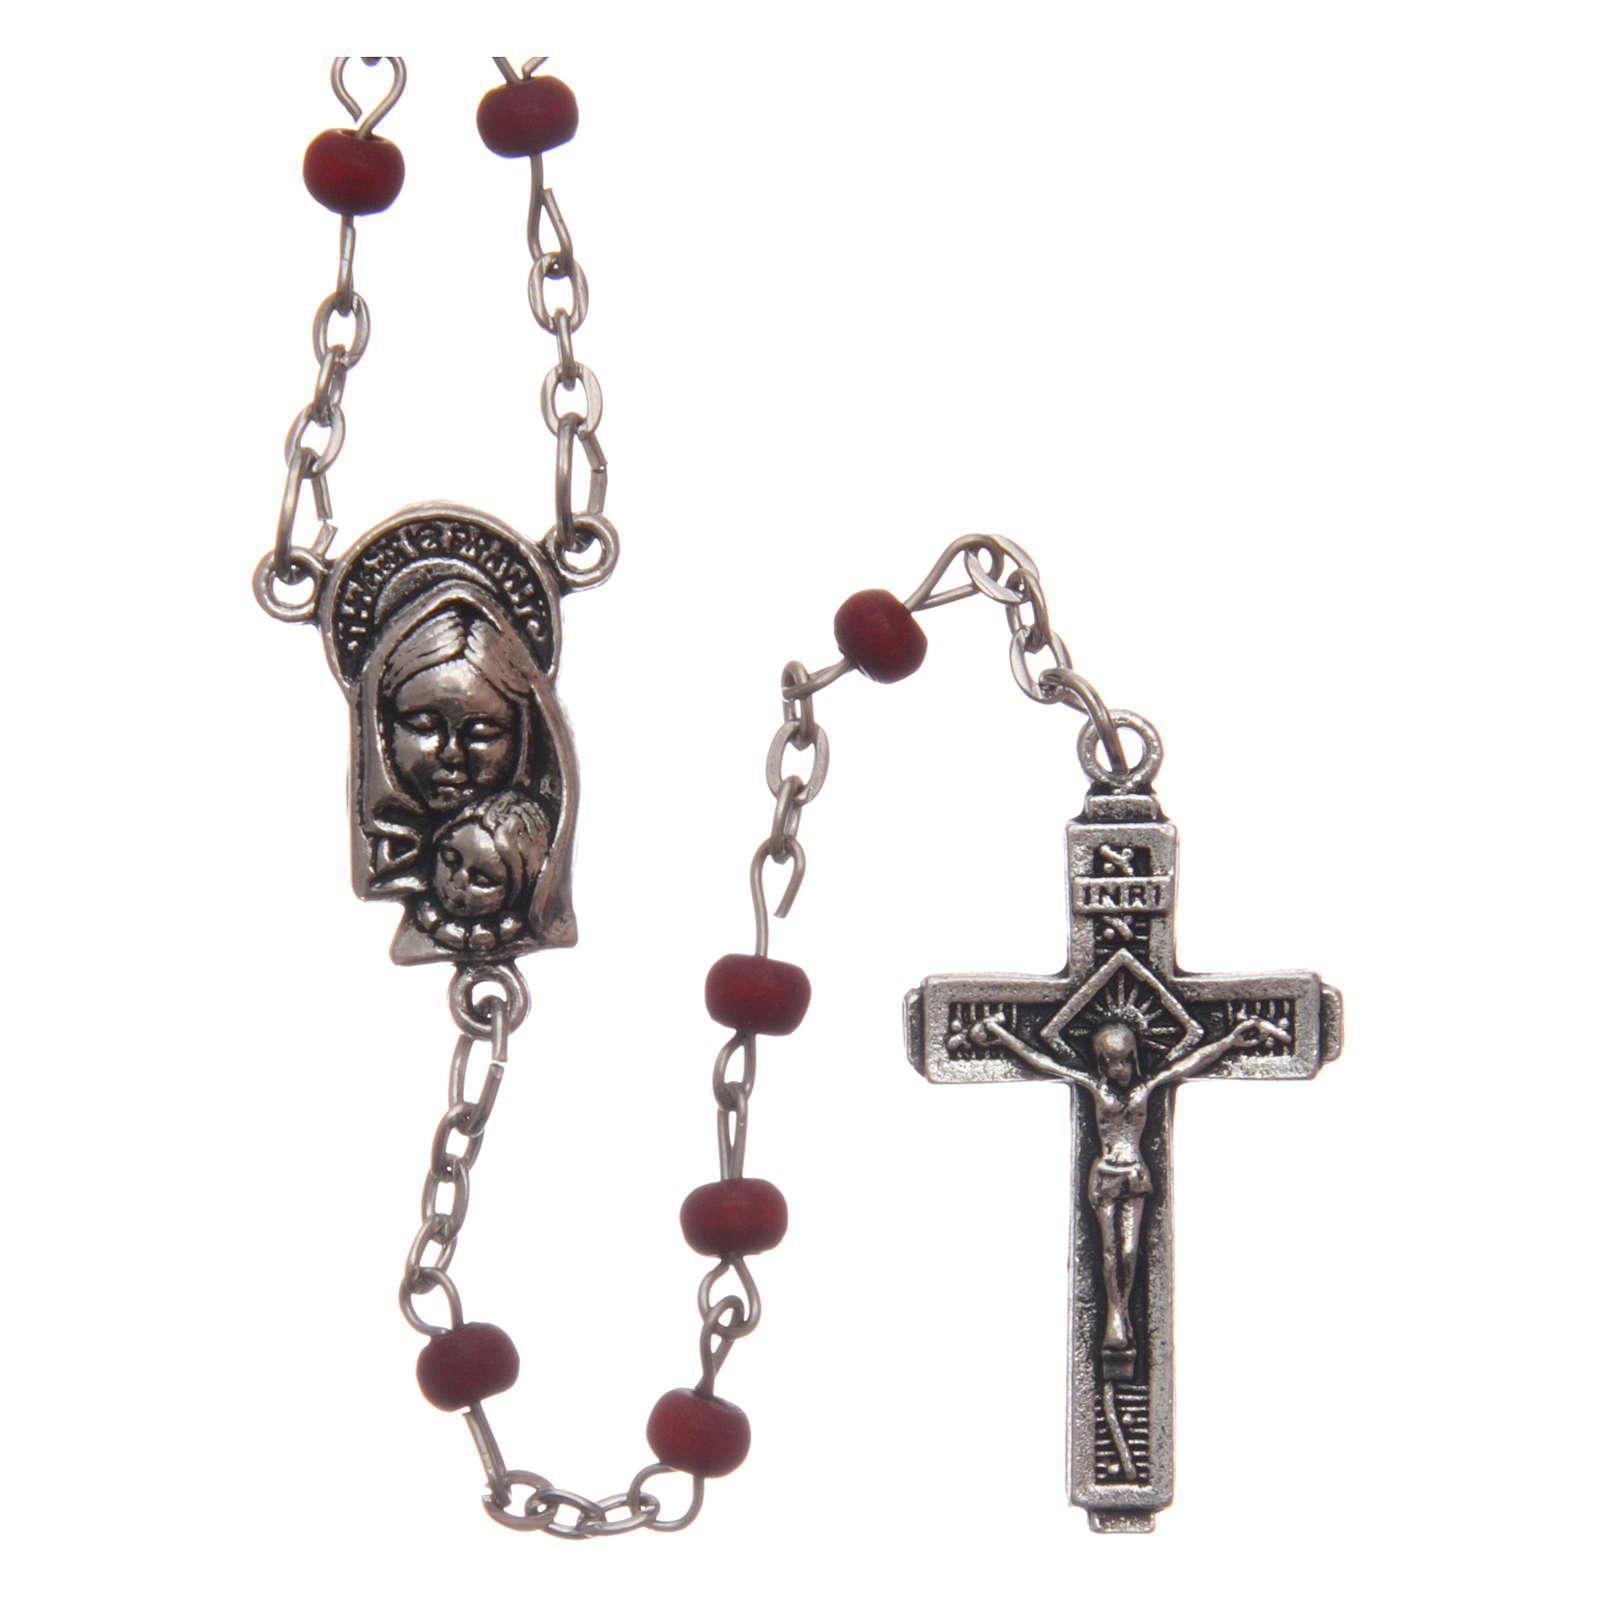 Wooden rose petal rosary, 4mm 4